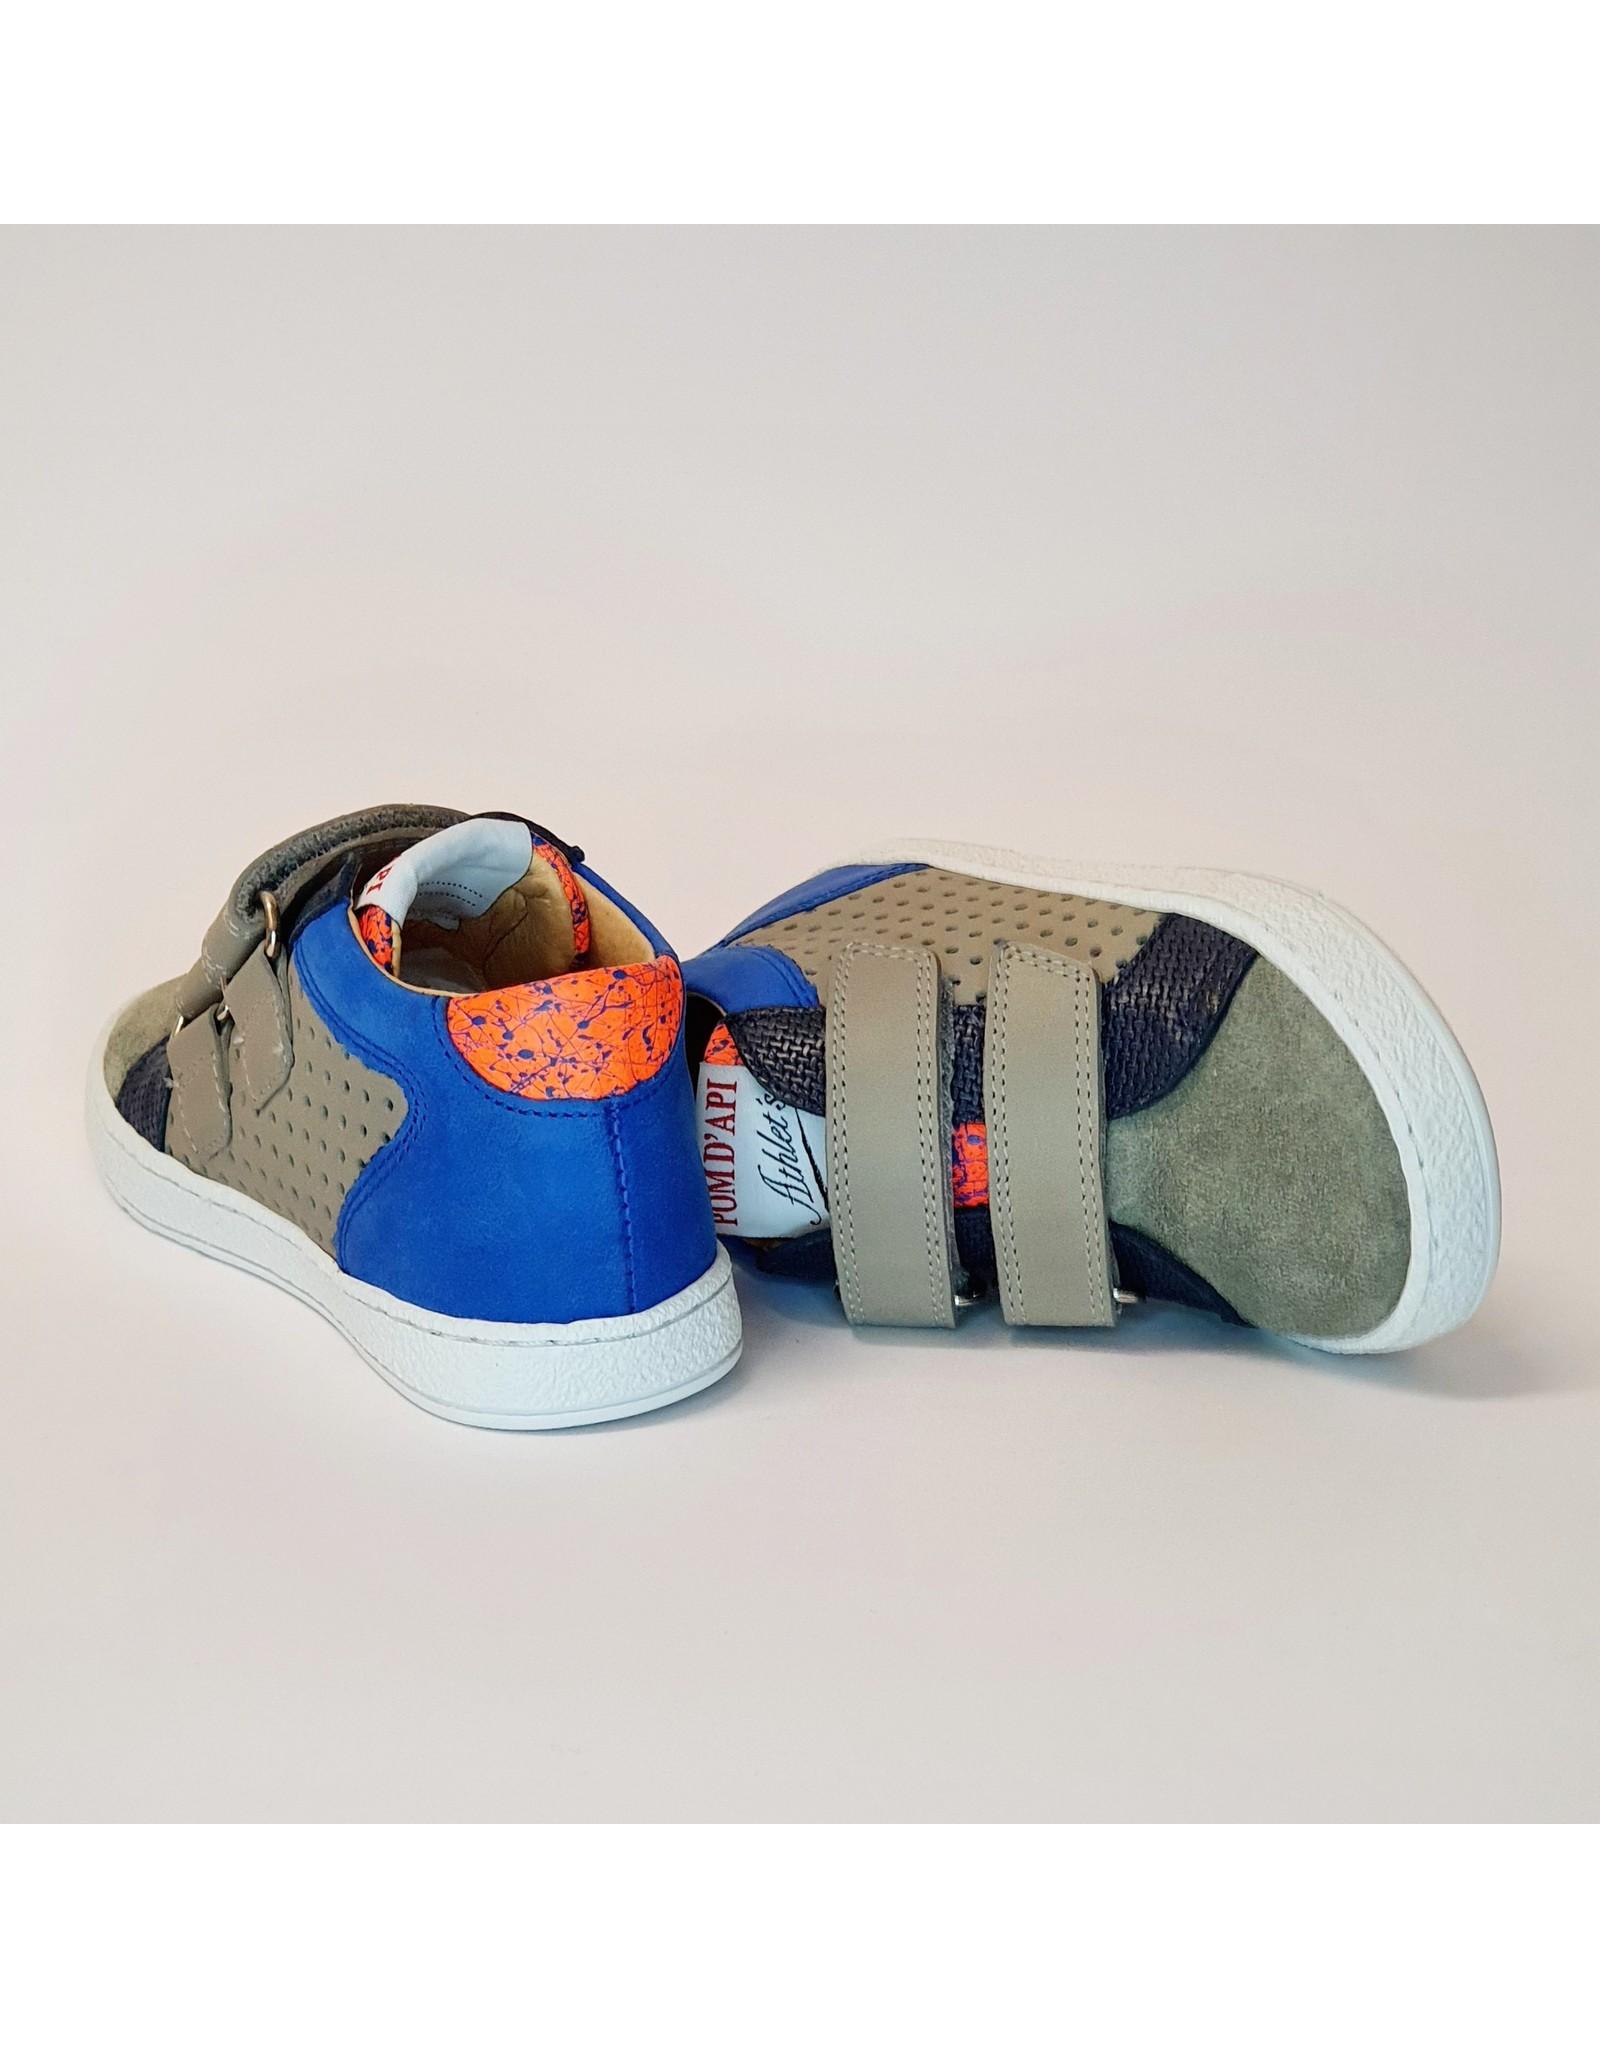 Pom d'Api sneaker velcro mousse grijs/blauw